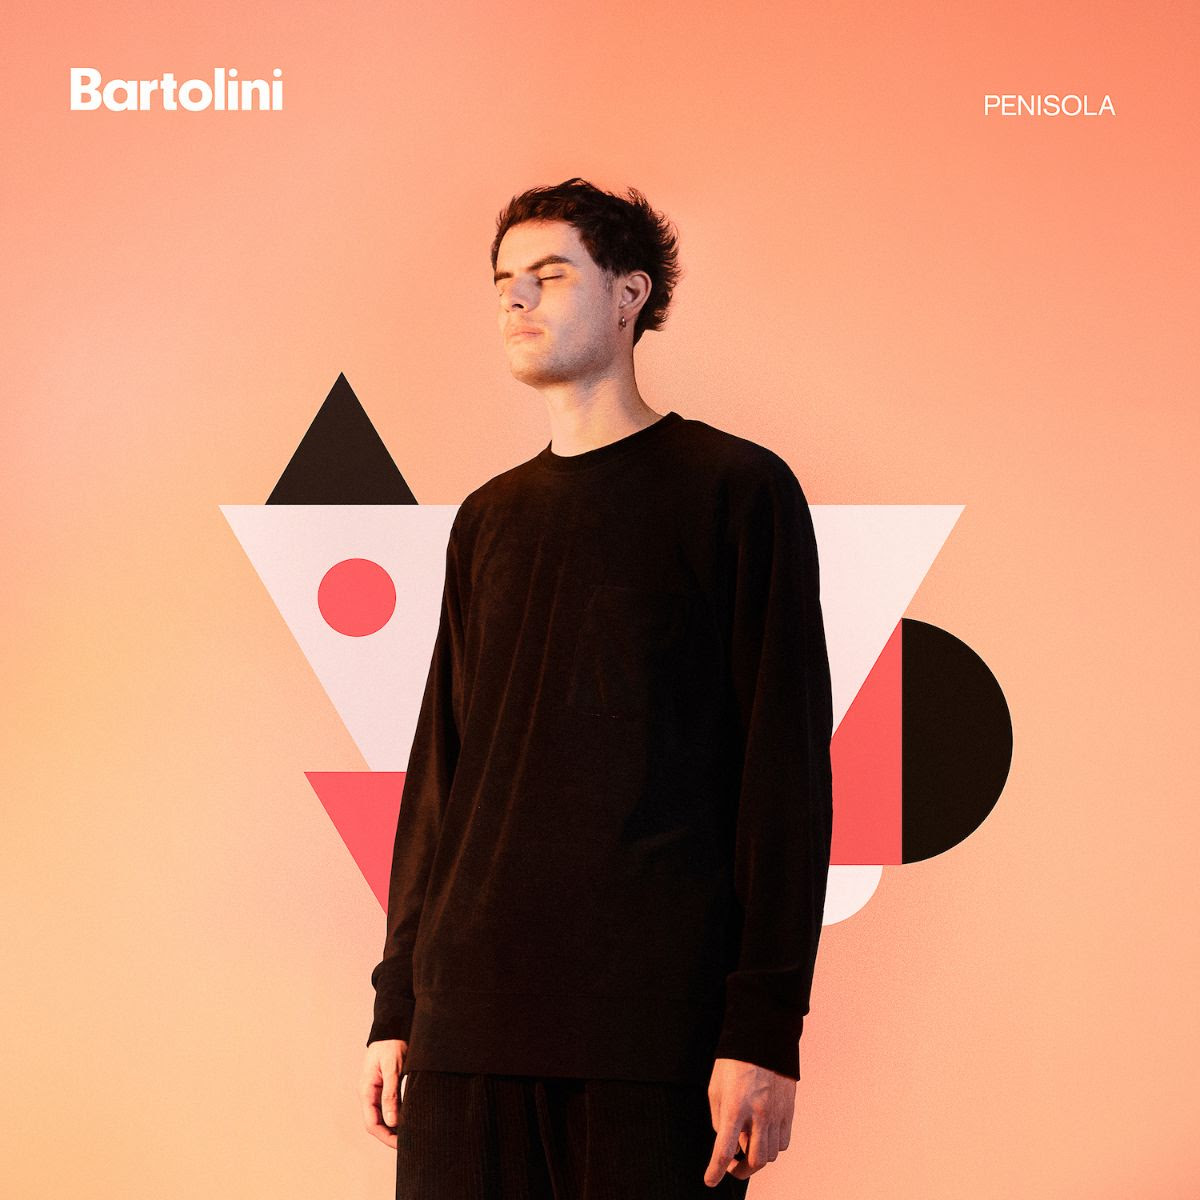 Bartolini Penisola cover